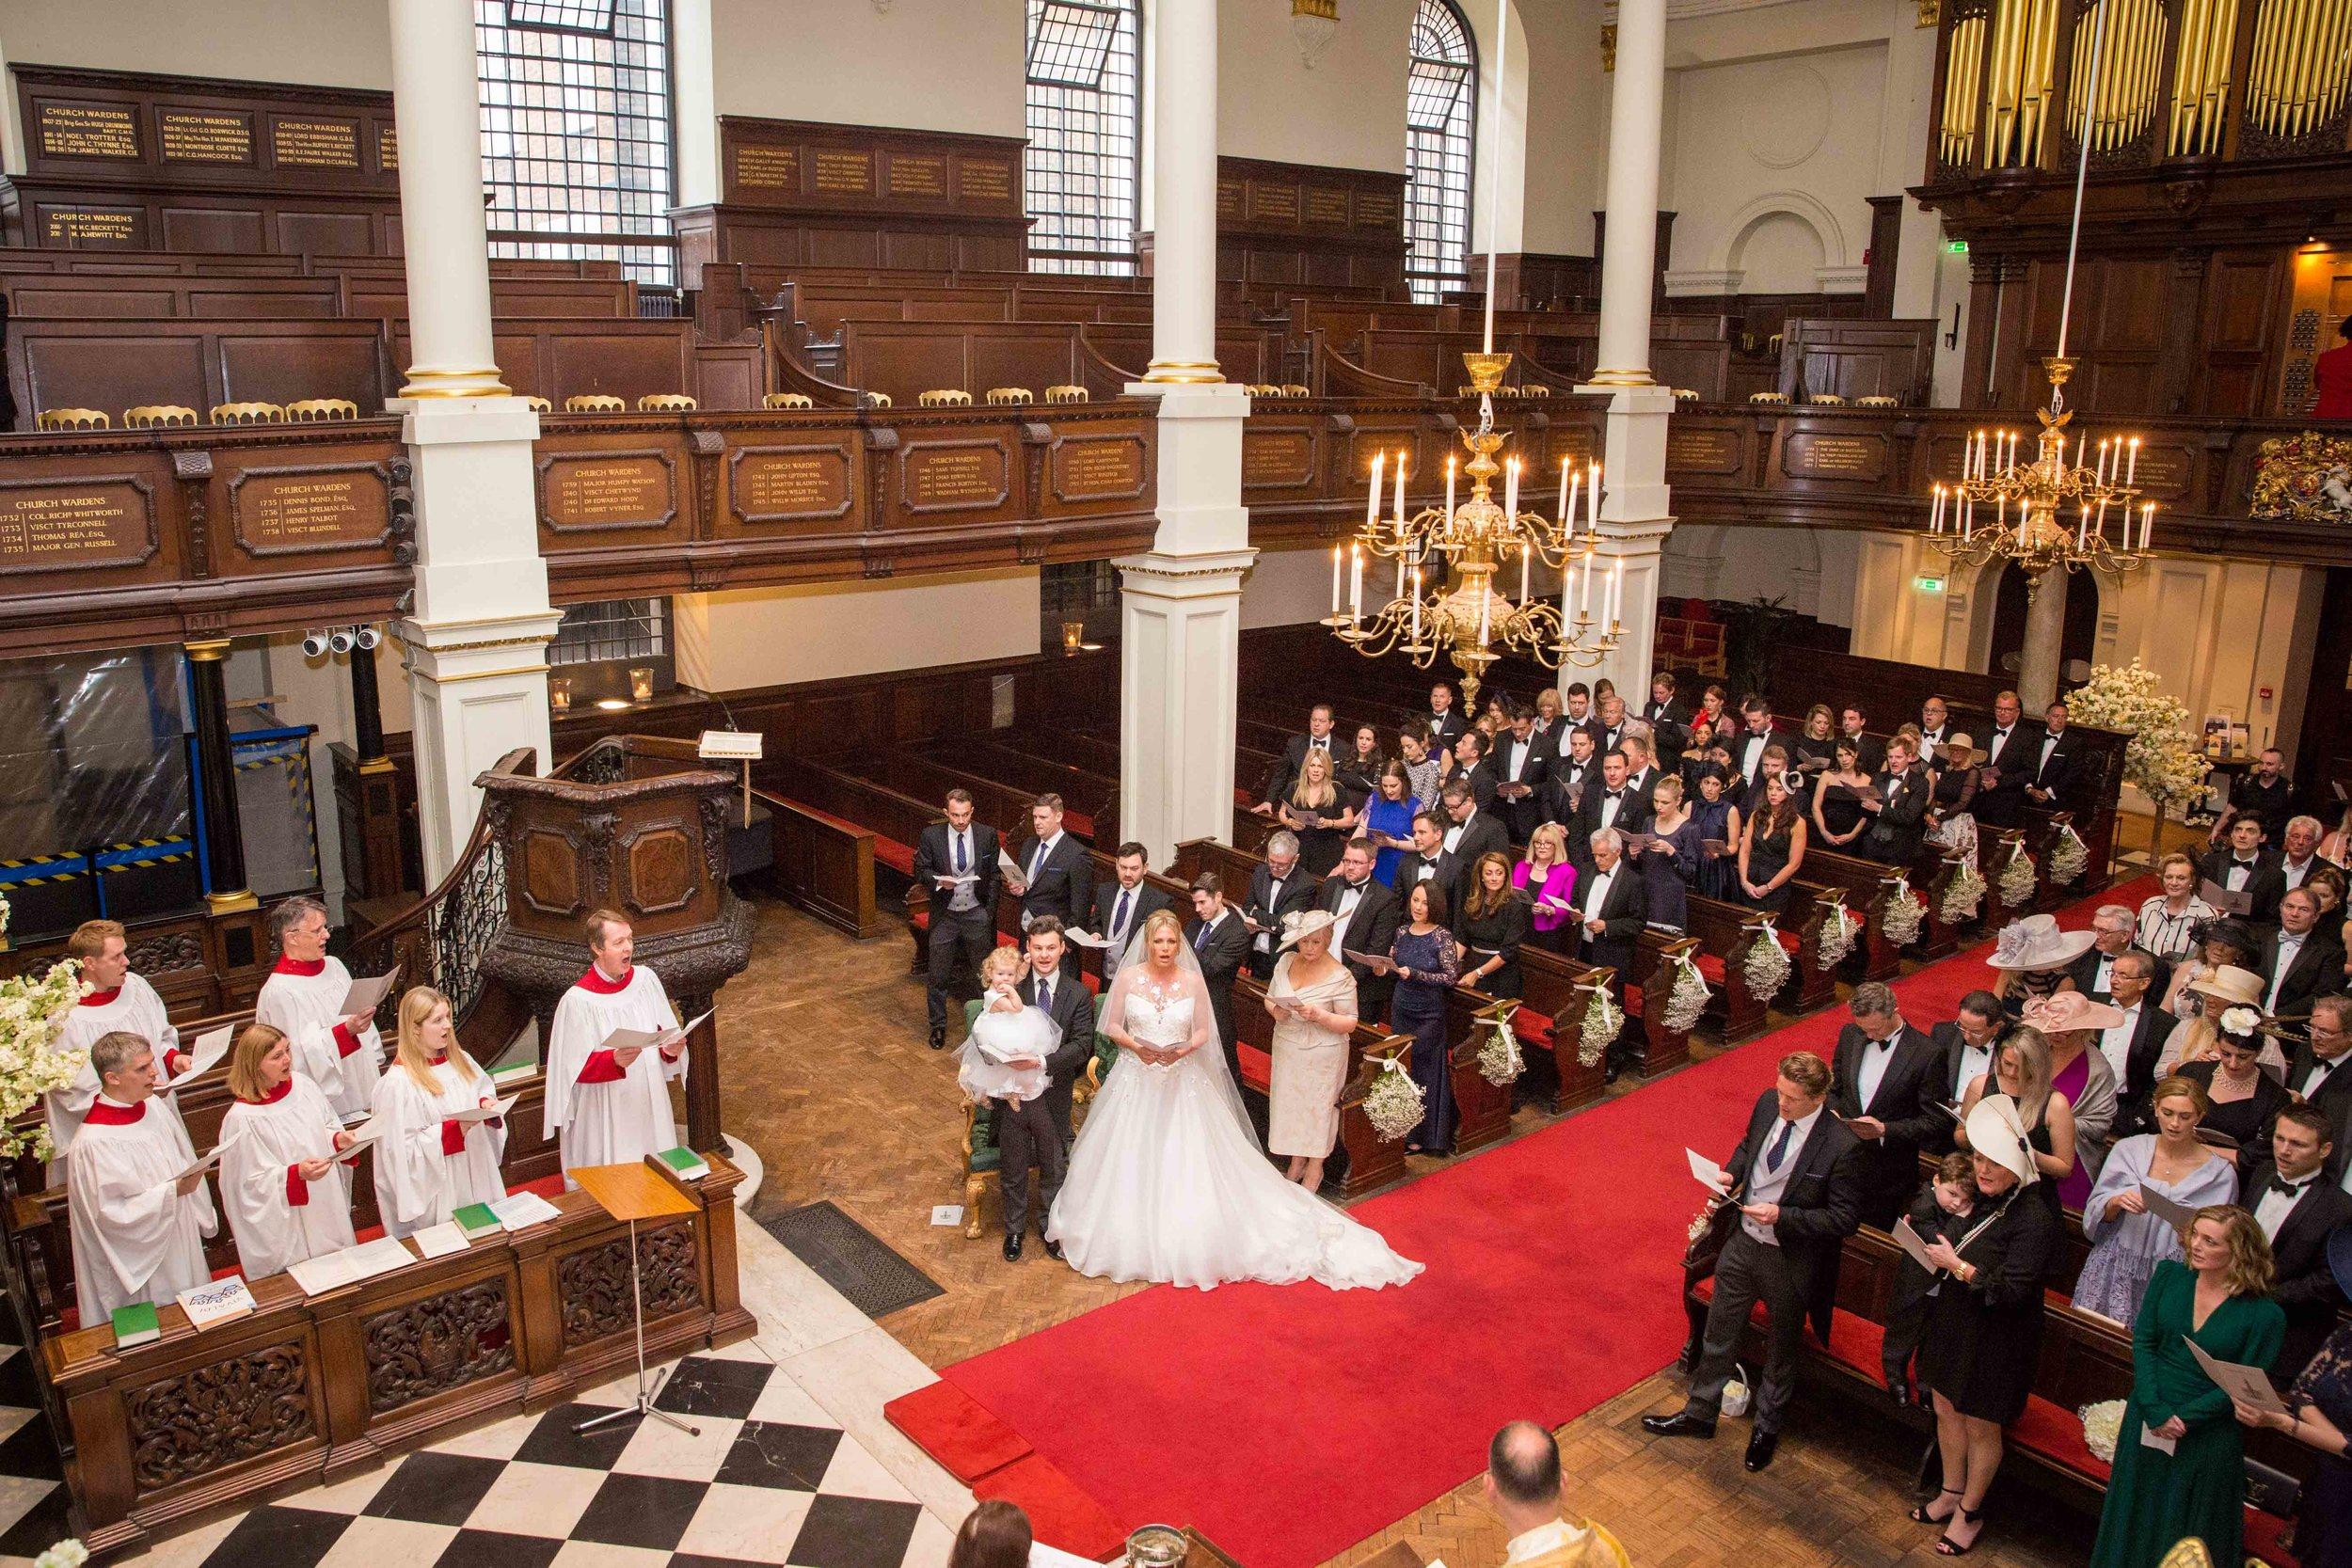 claridges-hotel-wedding-photographer-london-mayfair-natalia-smith-photography-60.jpg